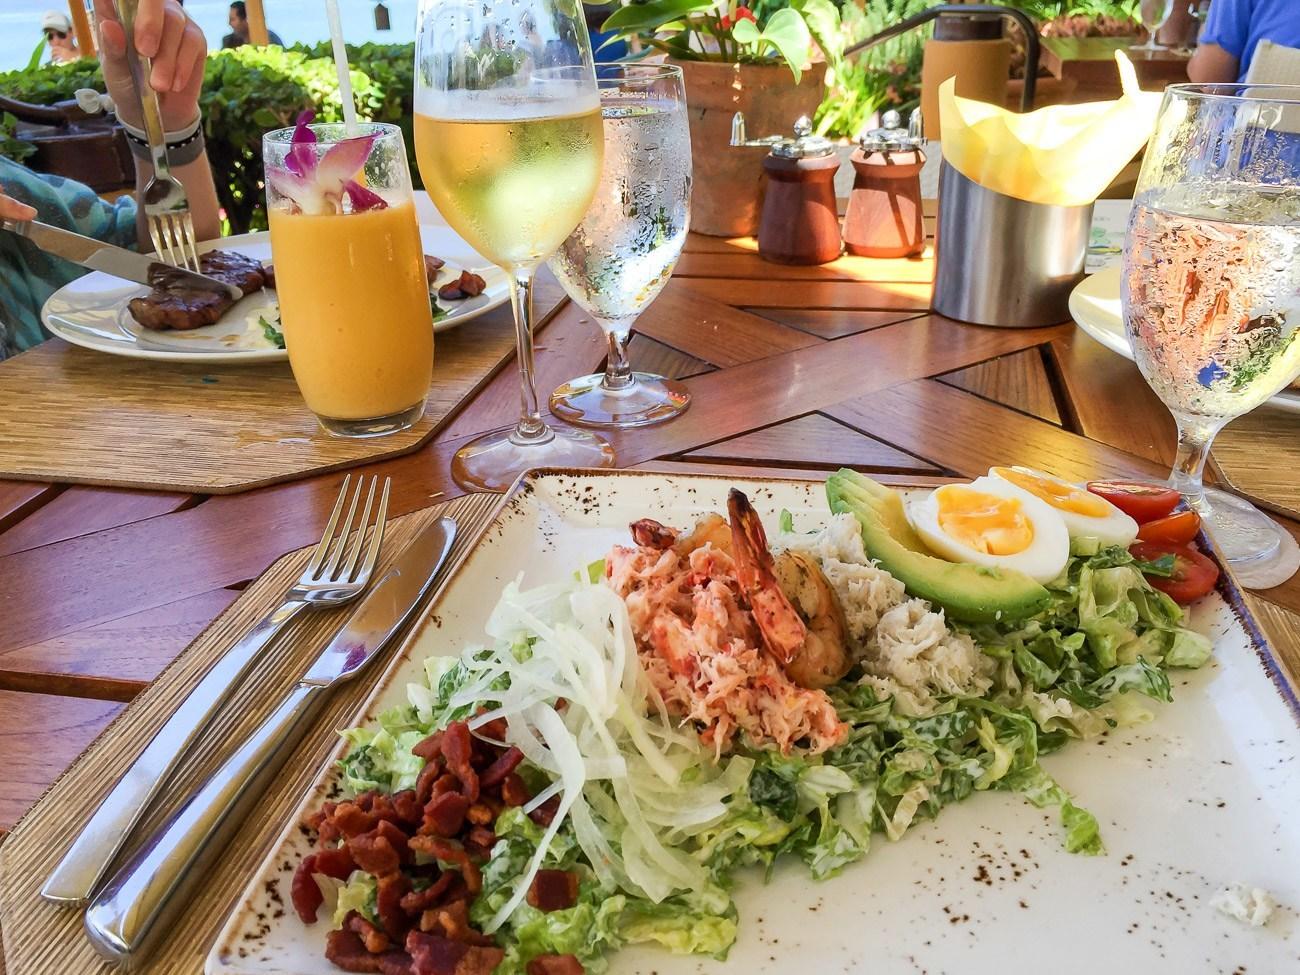 The seafood Cobb salad at Ferraro's near the pool at Four Seasons Resort Maui at Wailea